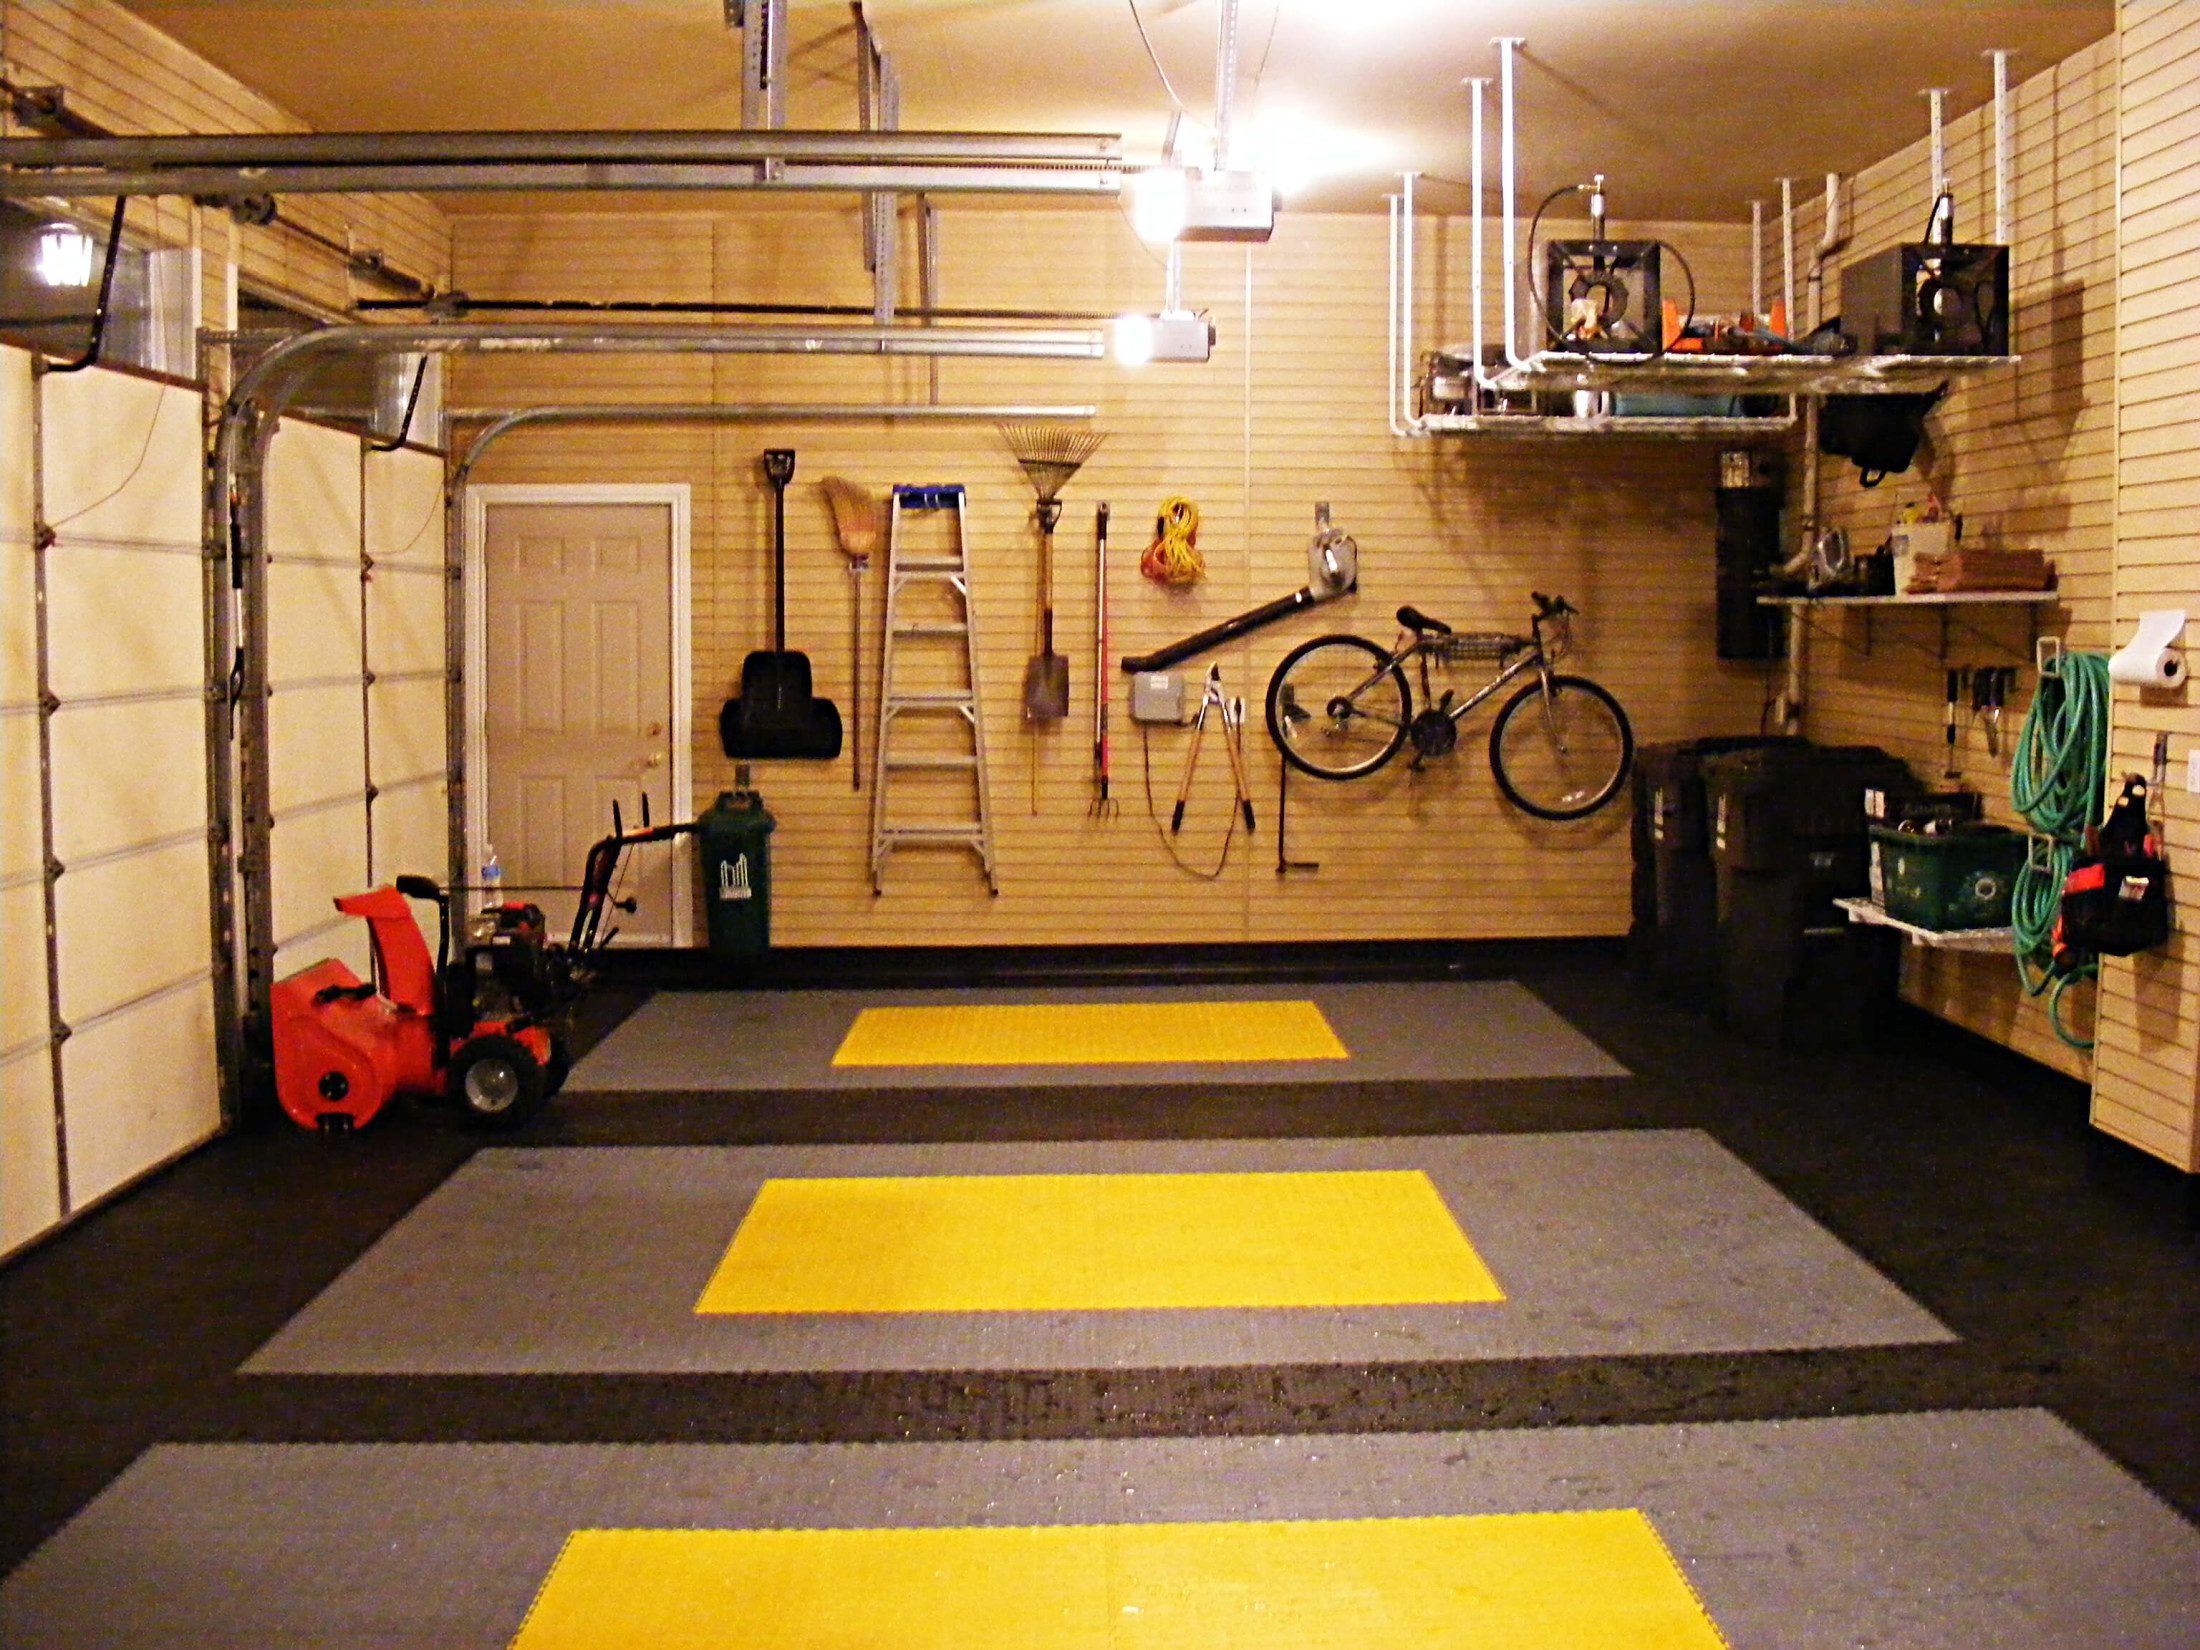 Menata ulang penyimpanan garasi (Sumber: nuvogarage.com)